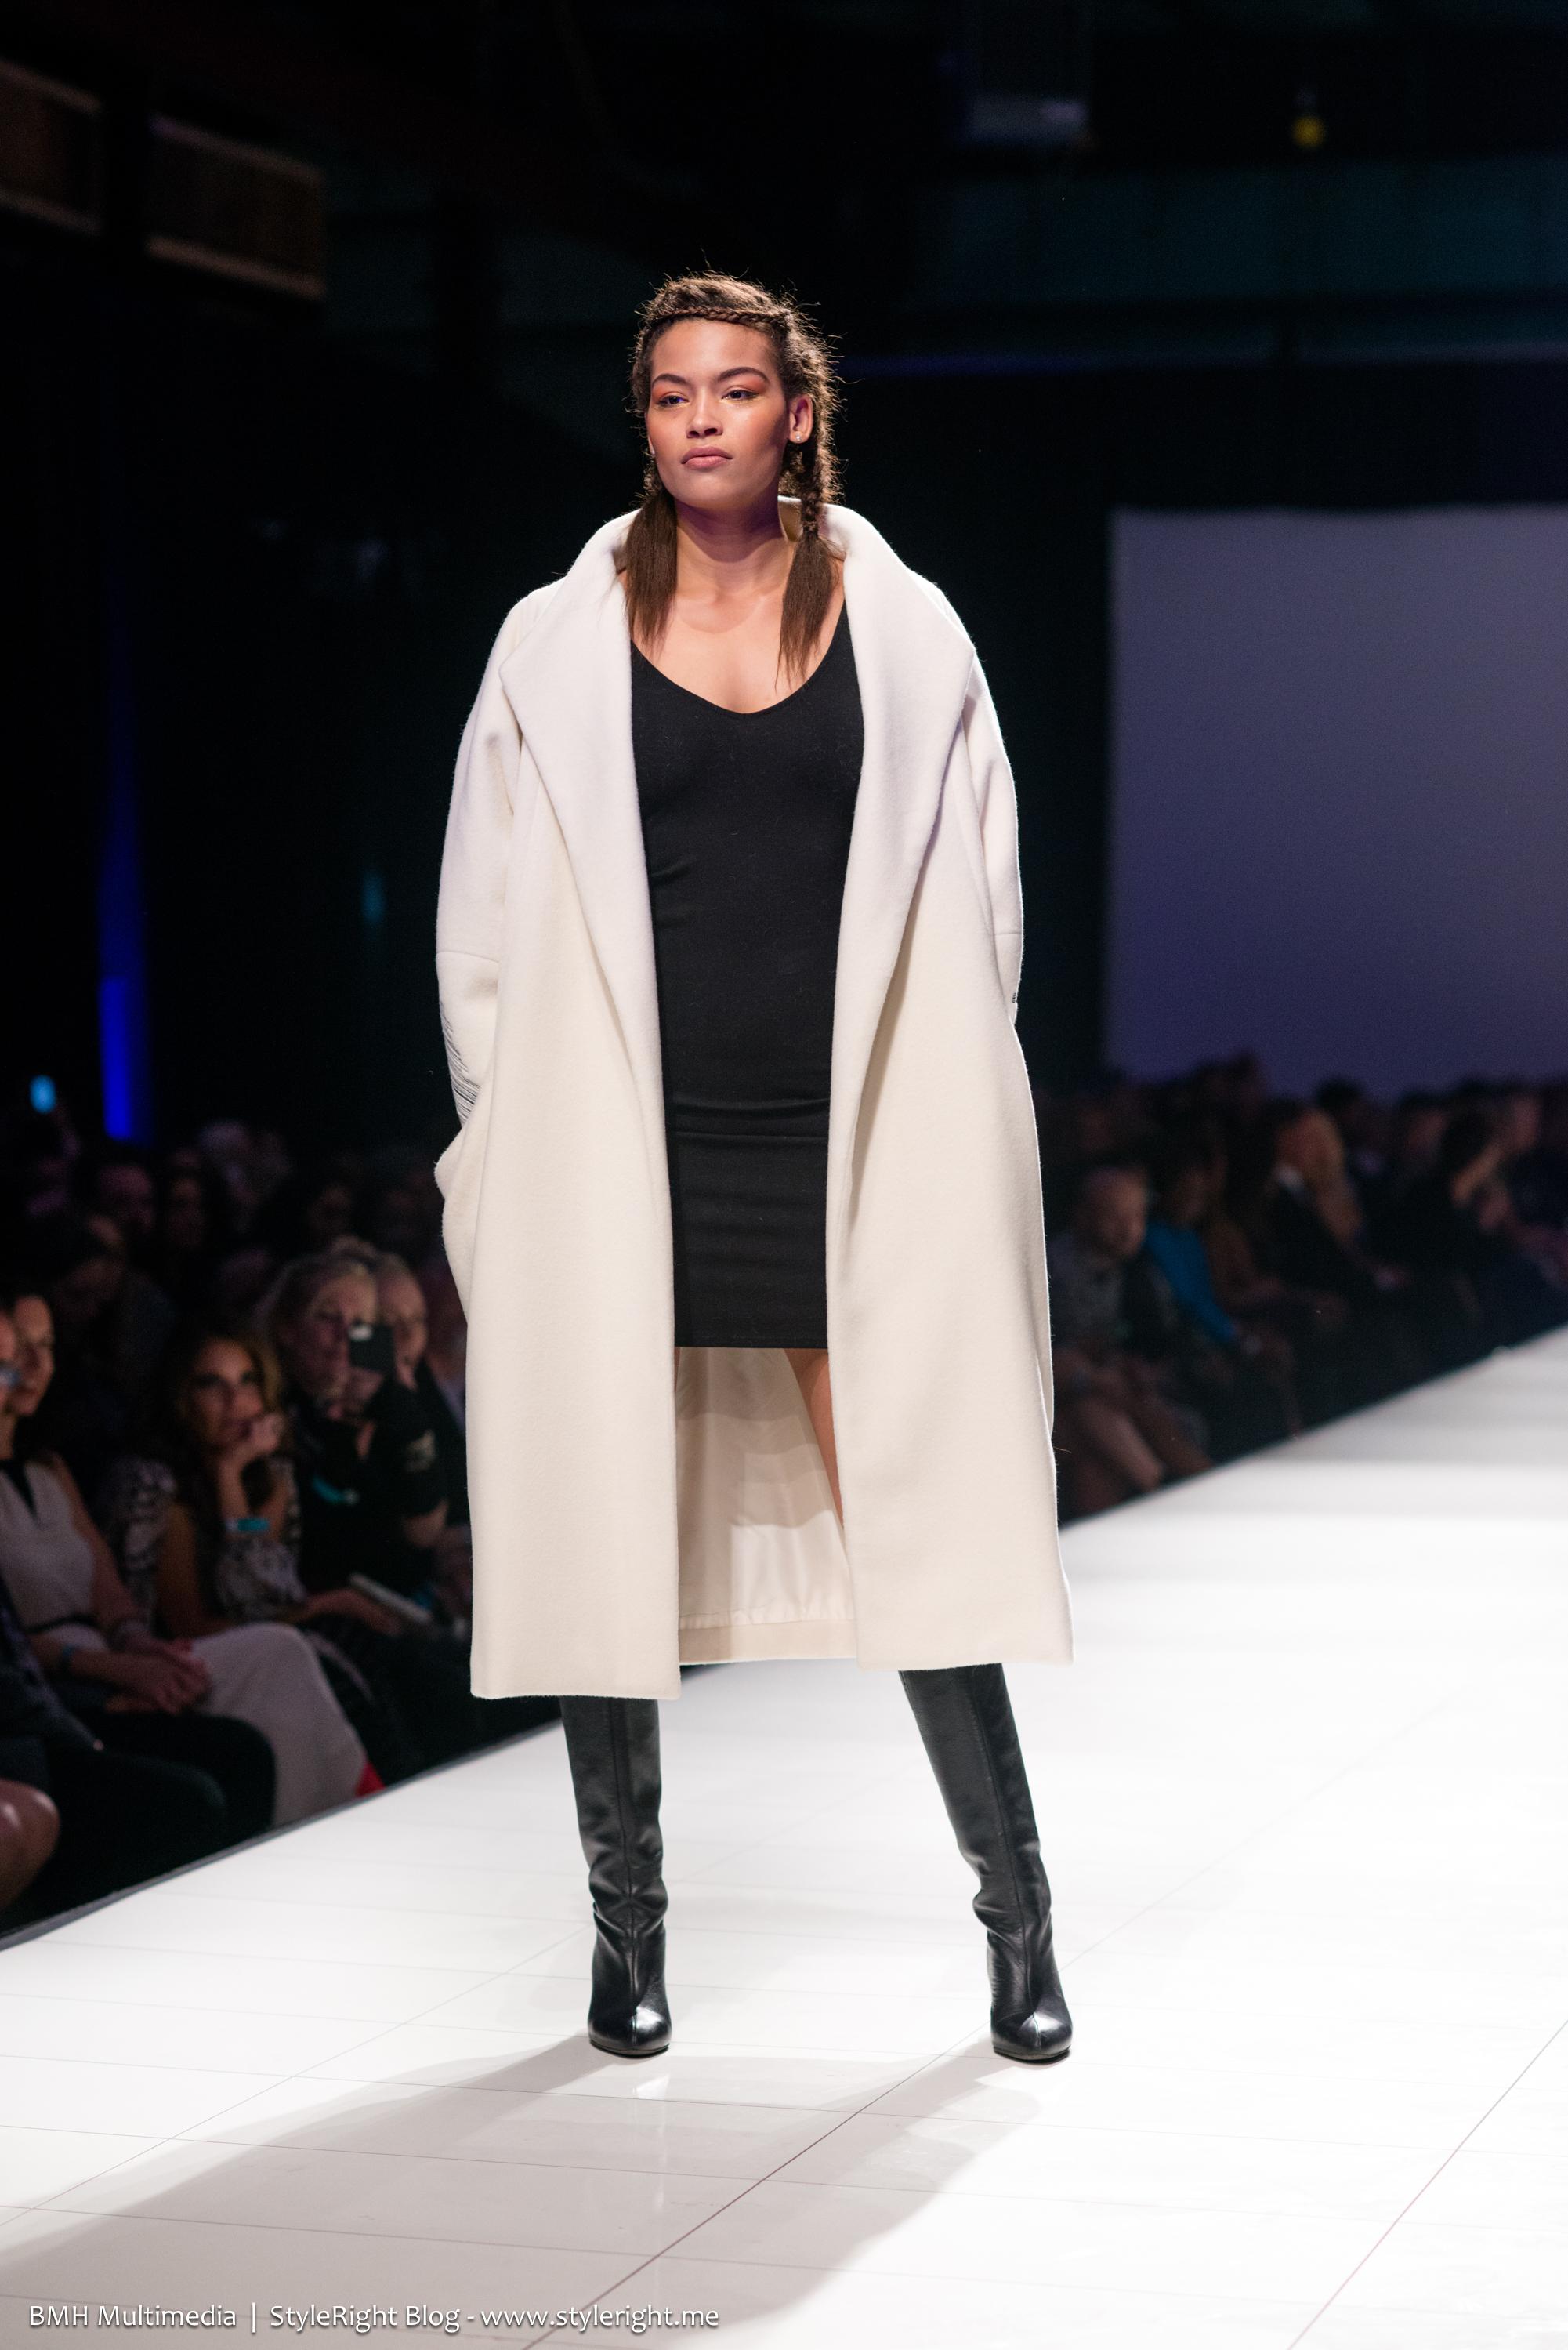 2017-fashionxt-night-2-6971.jpg